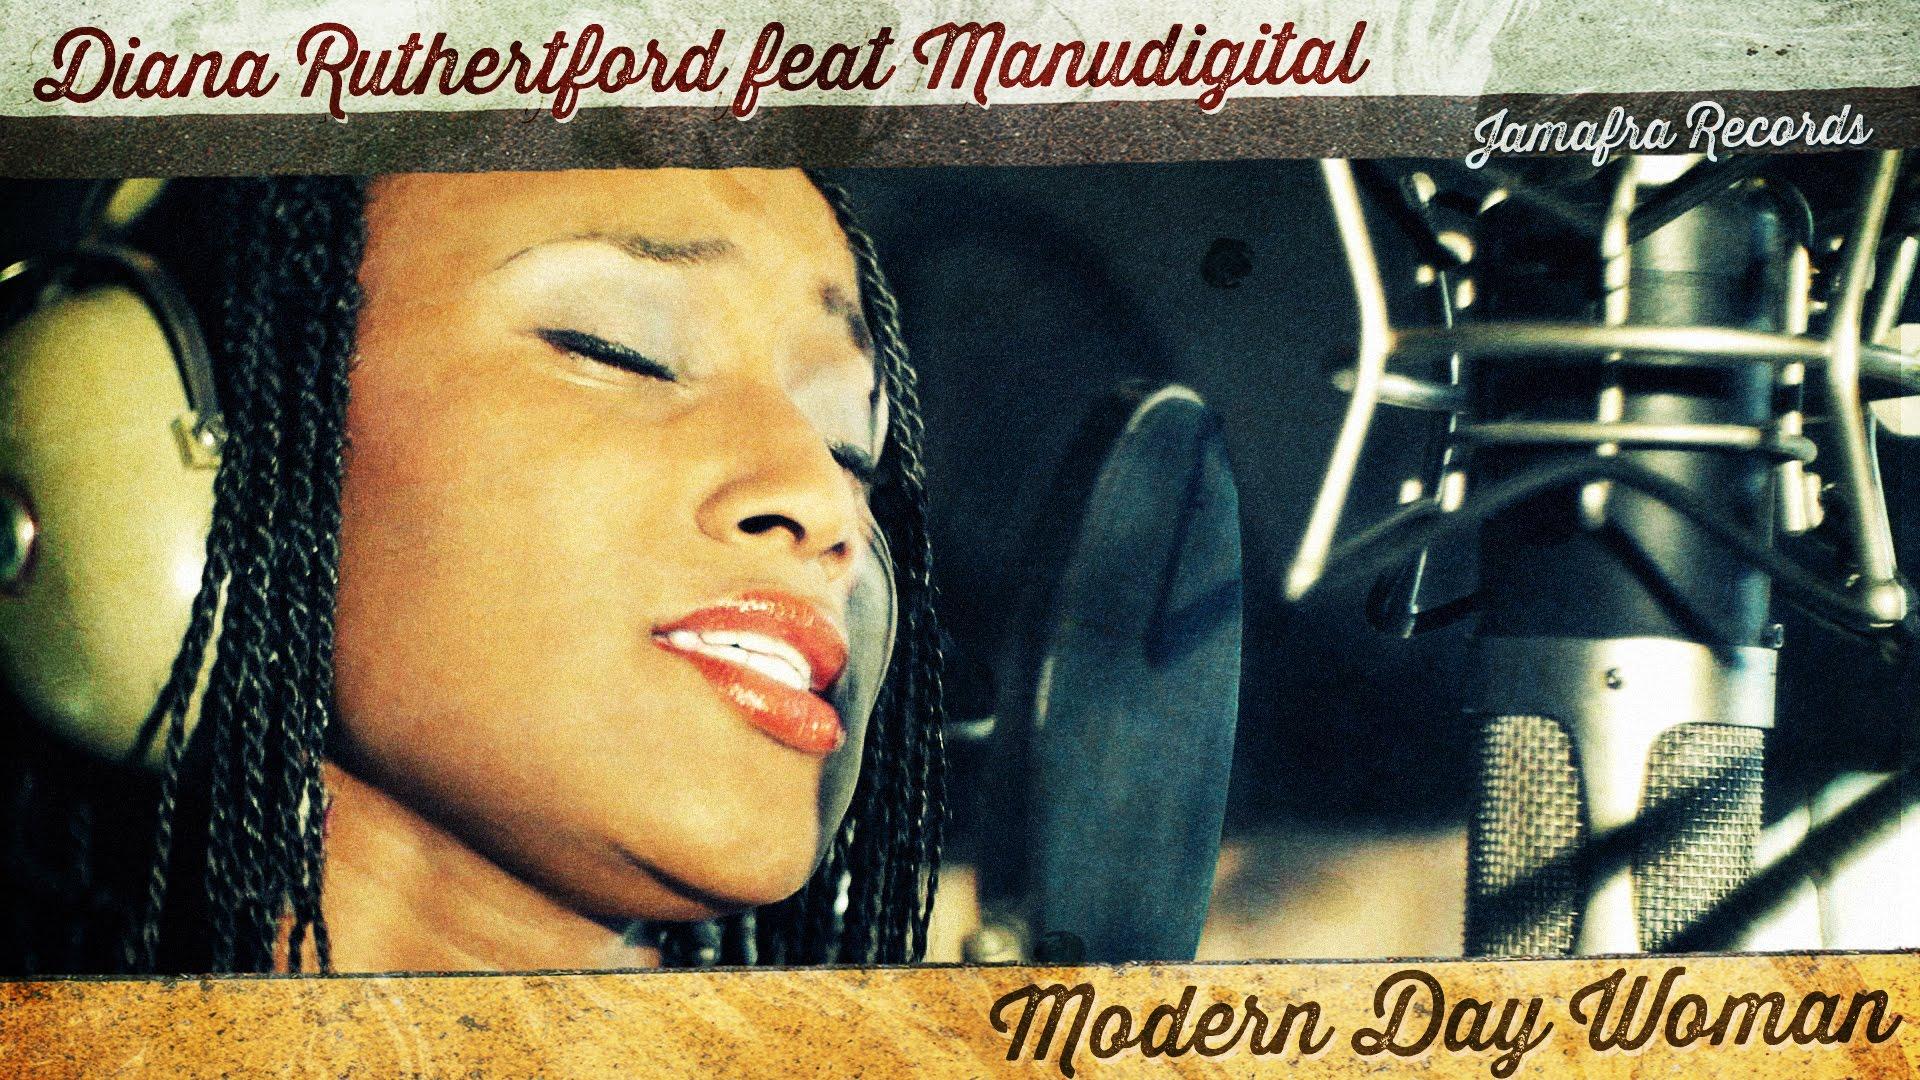 Diana Rutherford feat. Manudigital - Modern Day Woman [11/27/2014]